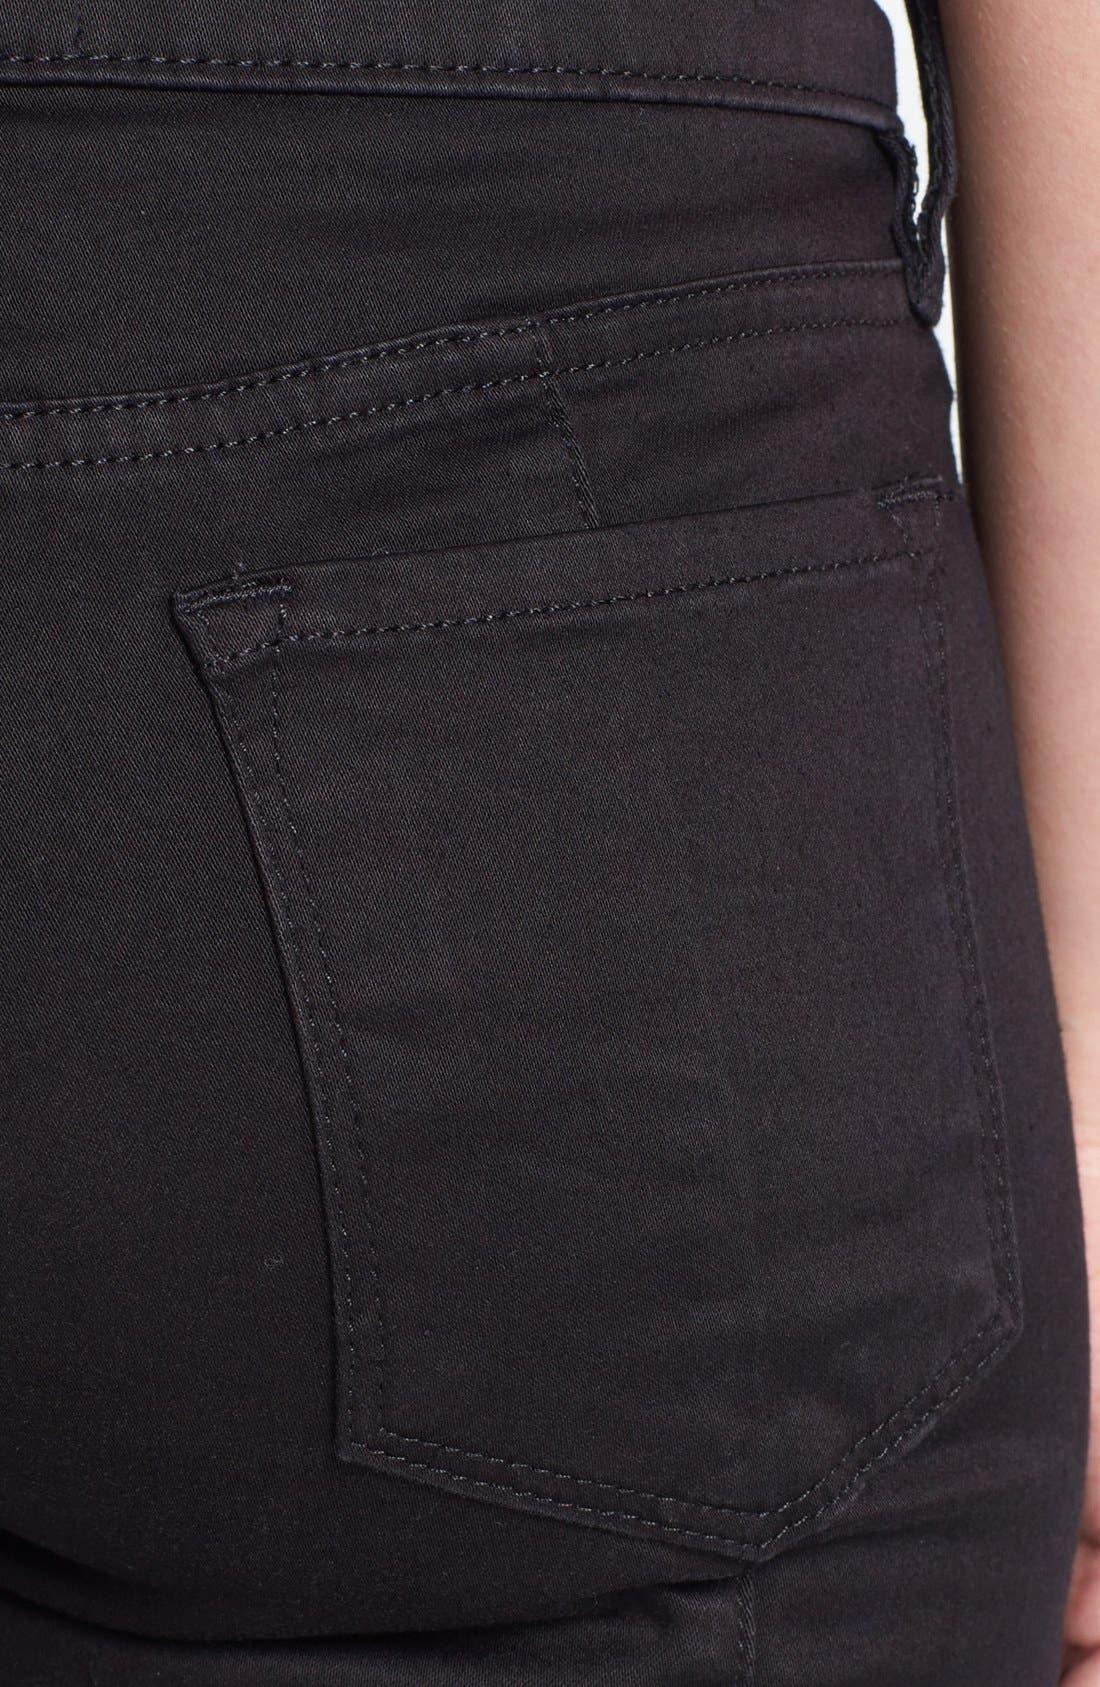 Alternate Image 3  - Frame Denim 'Le Luxe Biker' Skinny Jeans (Vian)